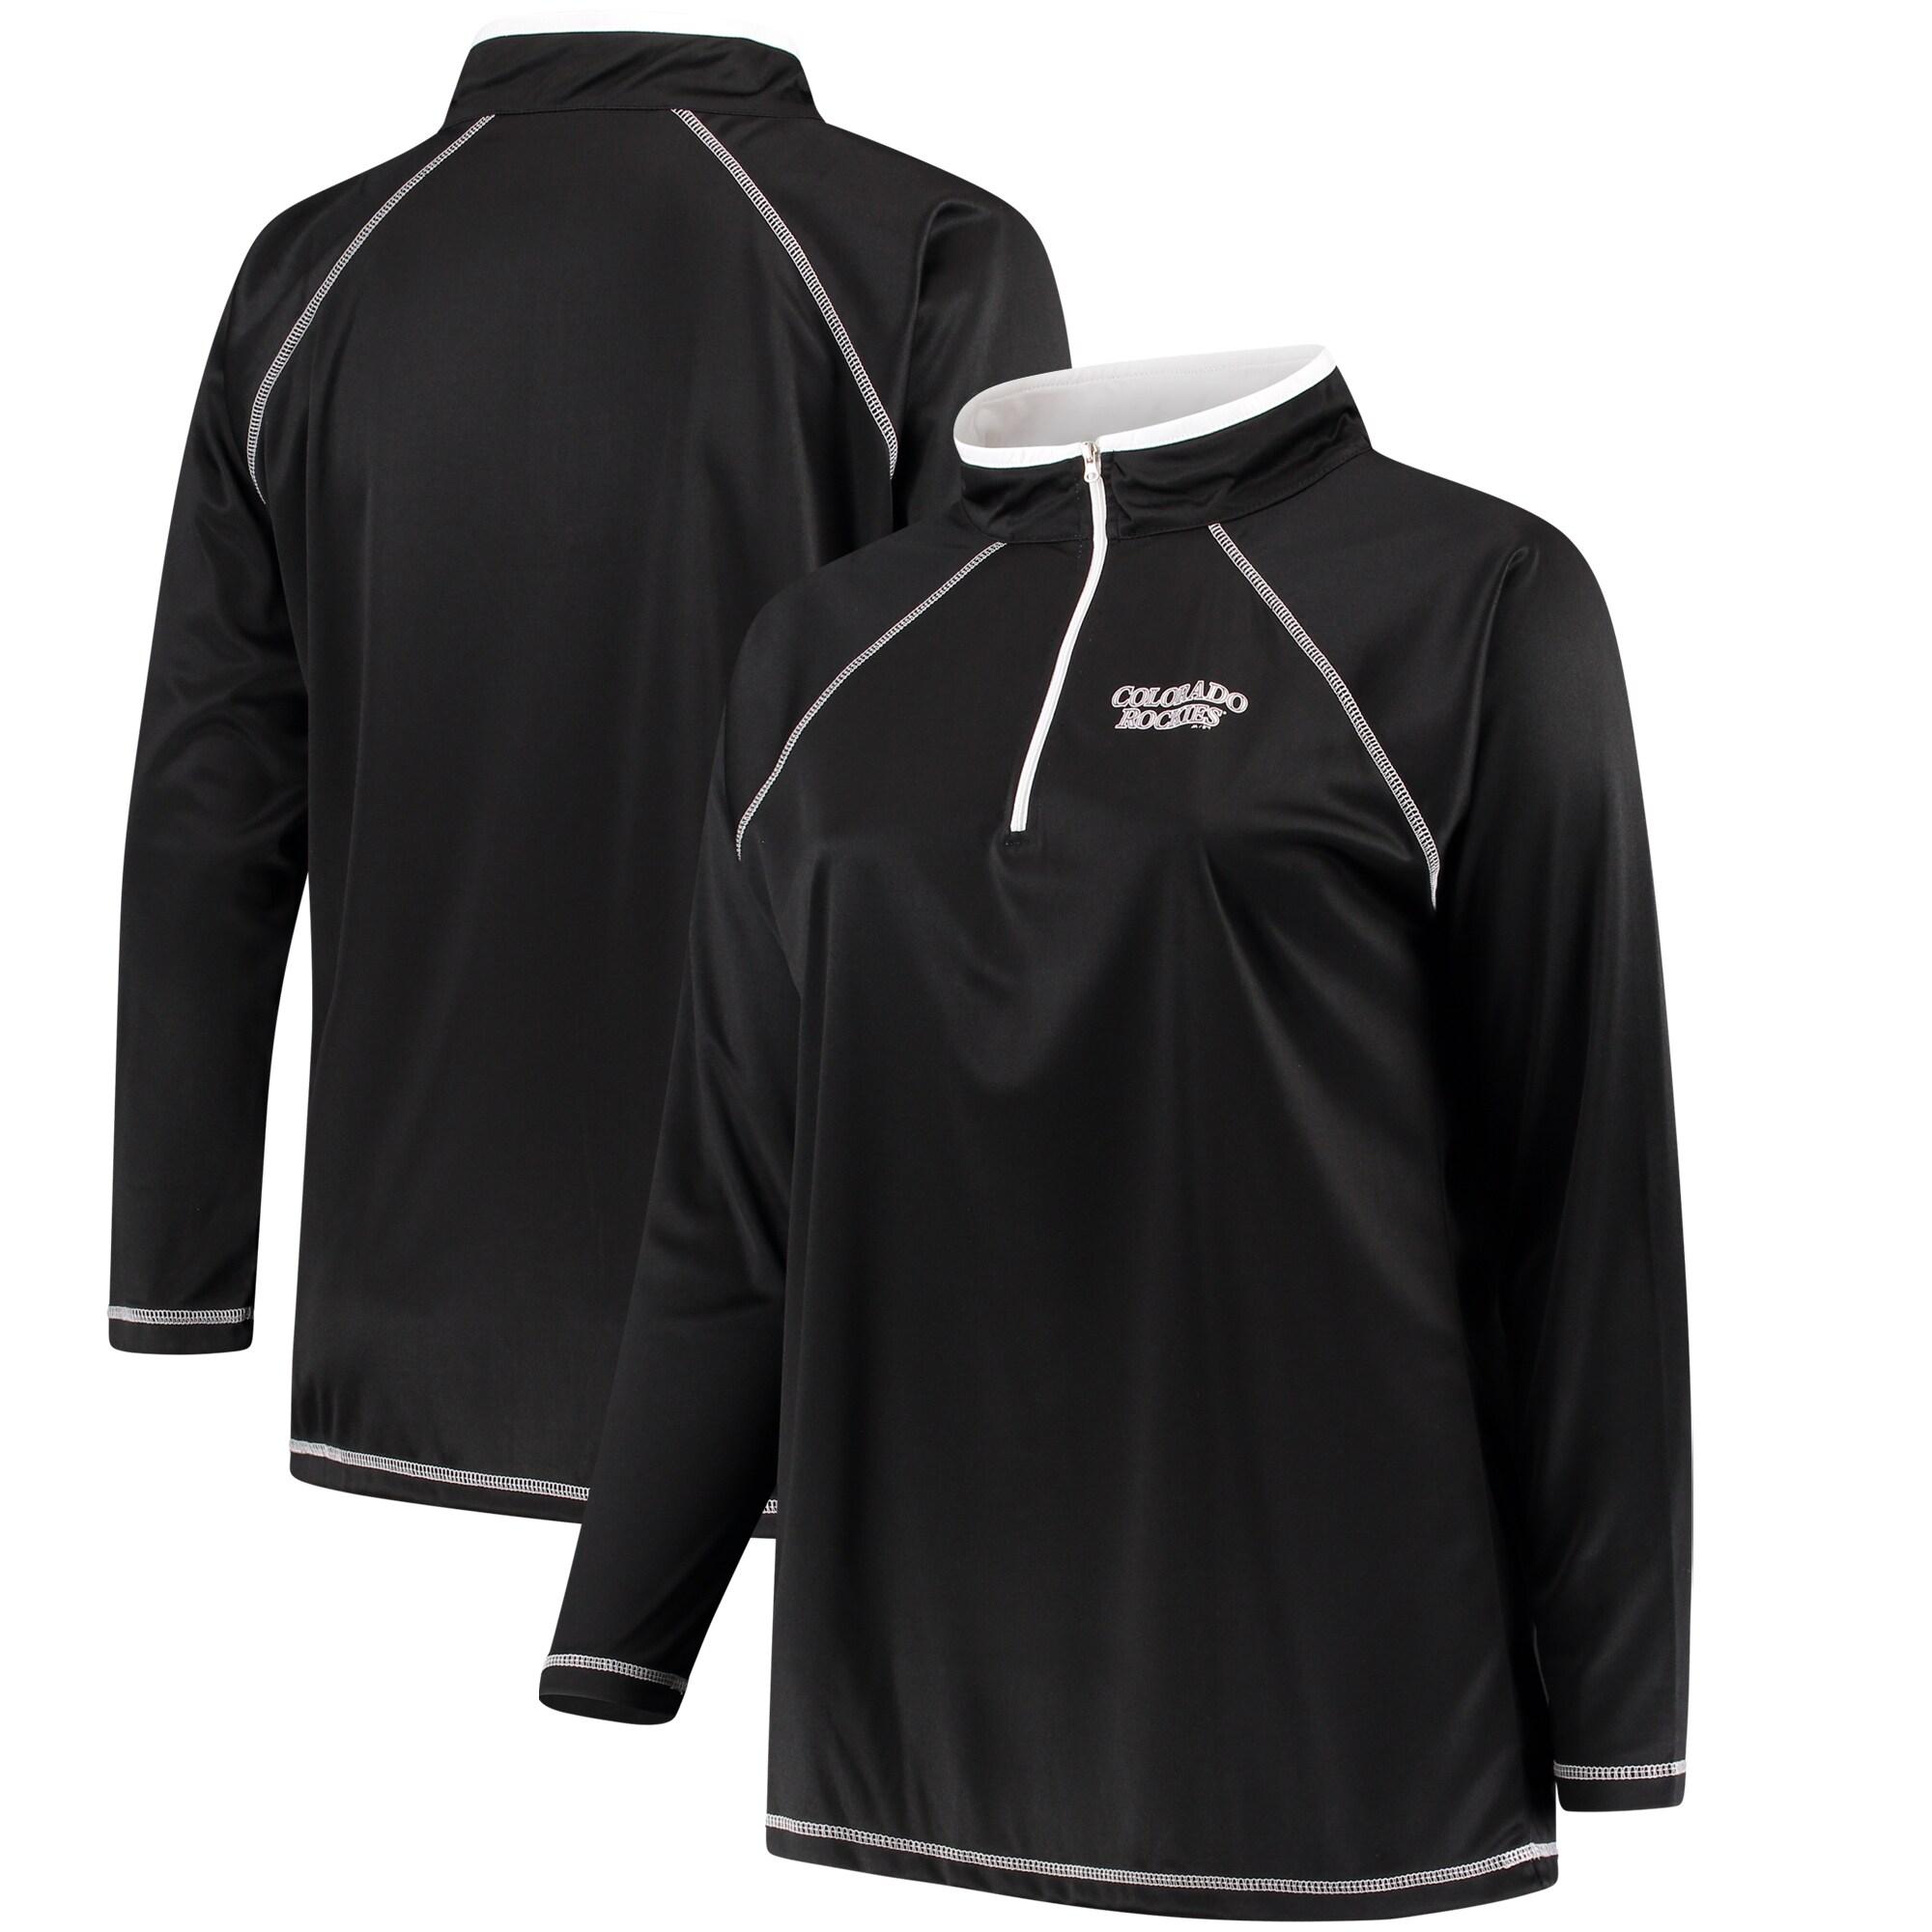 Colorado Rockies Majestic Women's Plus Size Quarter-Zip Pullover Jacket - Black